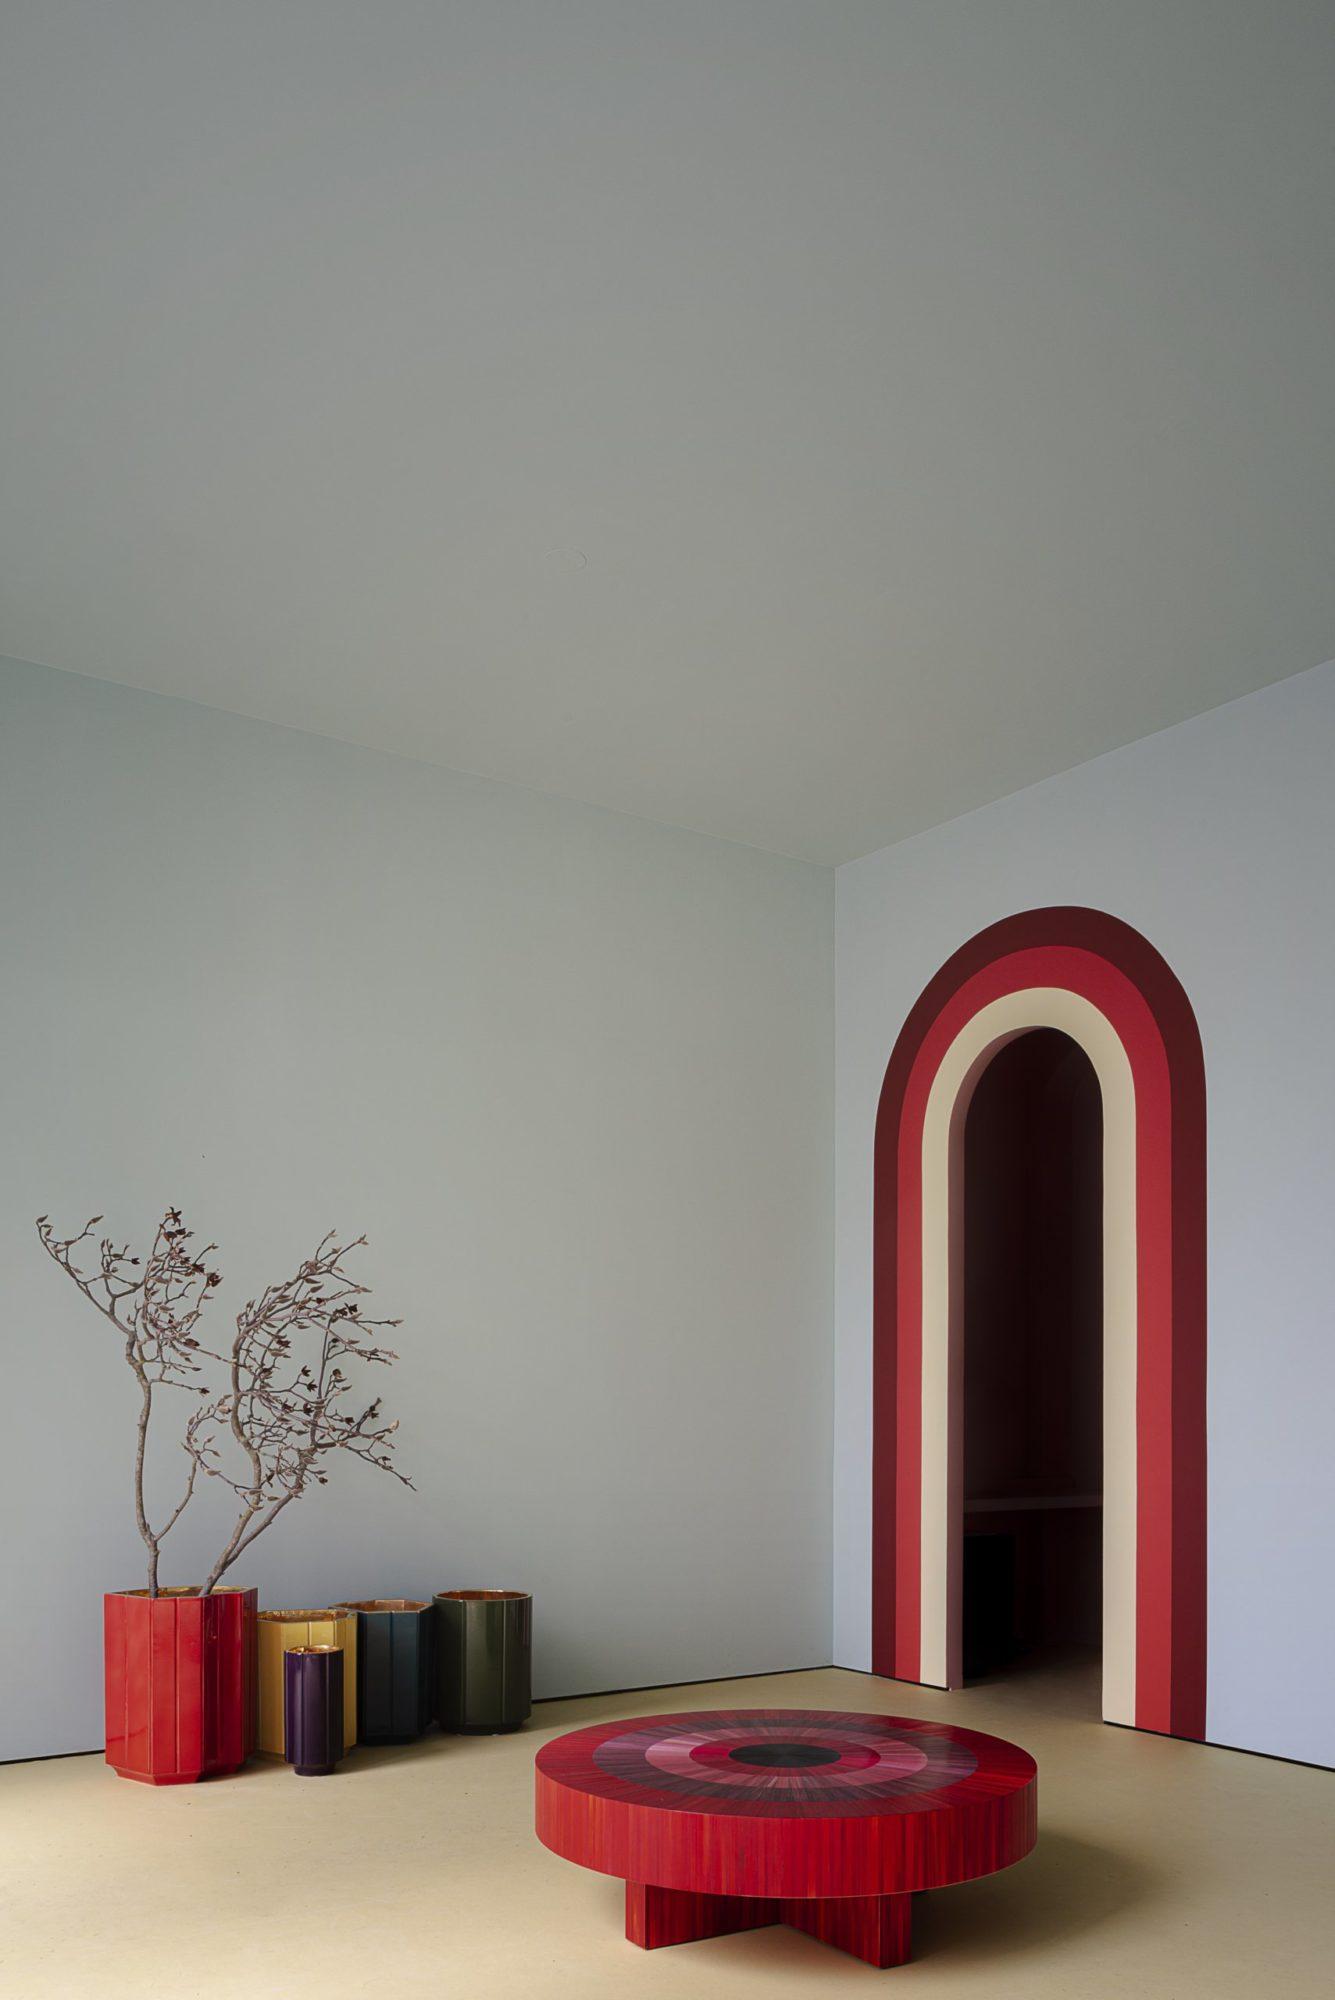 Project Room #1 - India Mahdavi